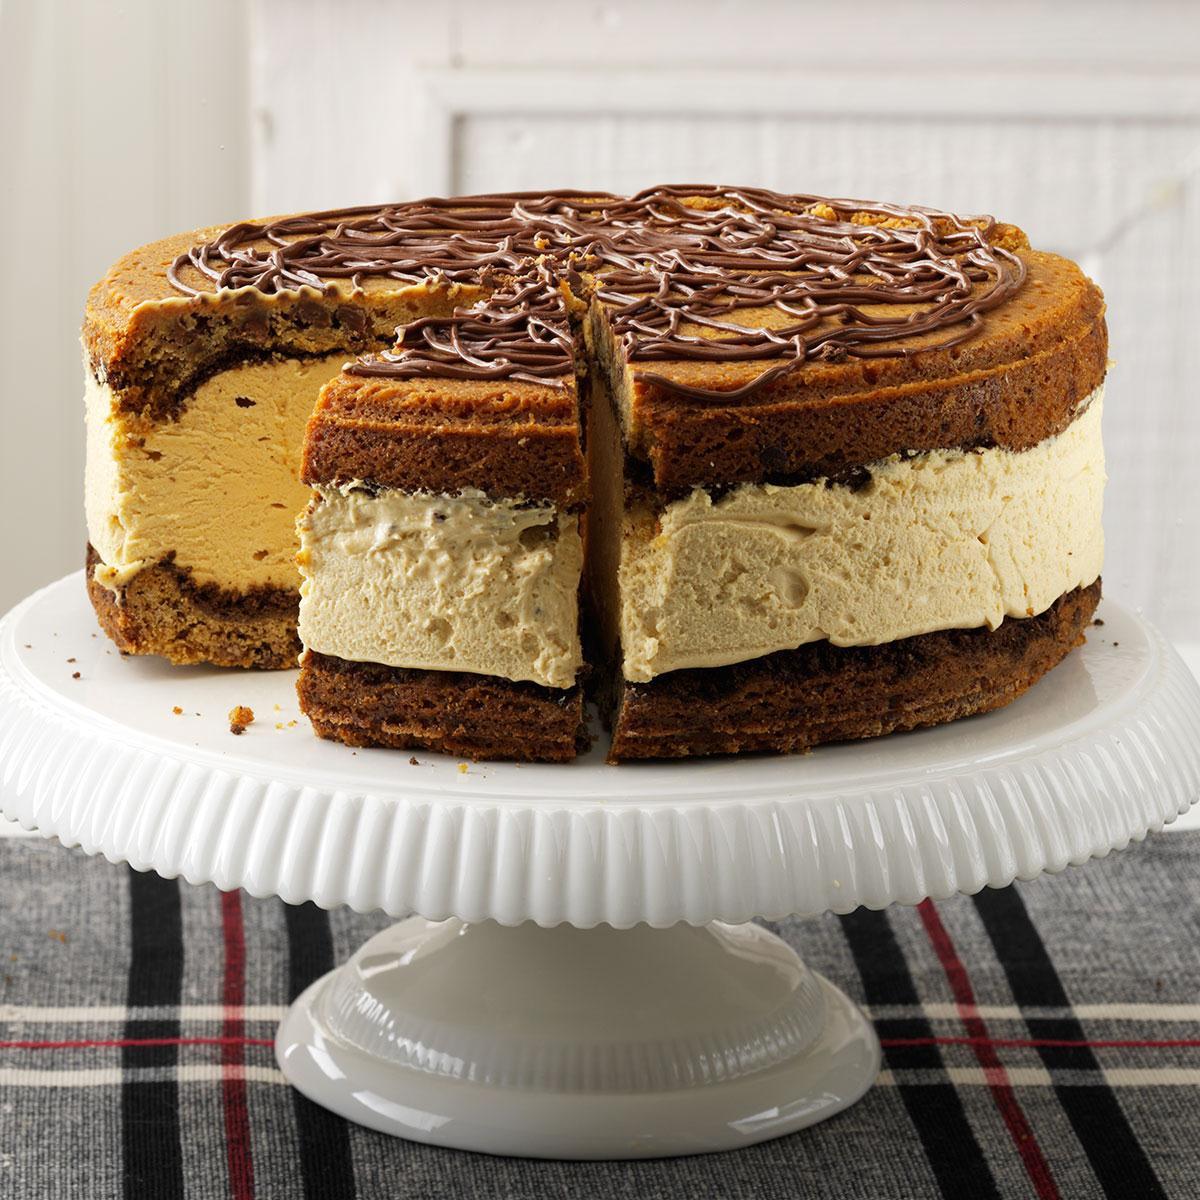 Ice Cream Sandwich Desserts Recipes  Giant Peanut Butter Ice Cream Sandwich Recipe